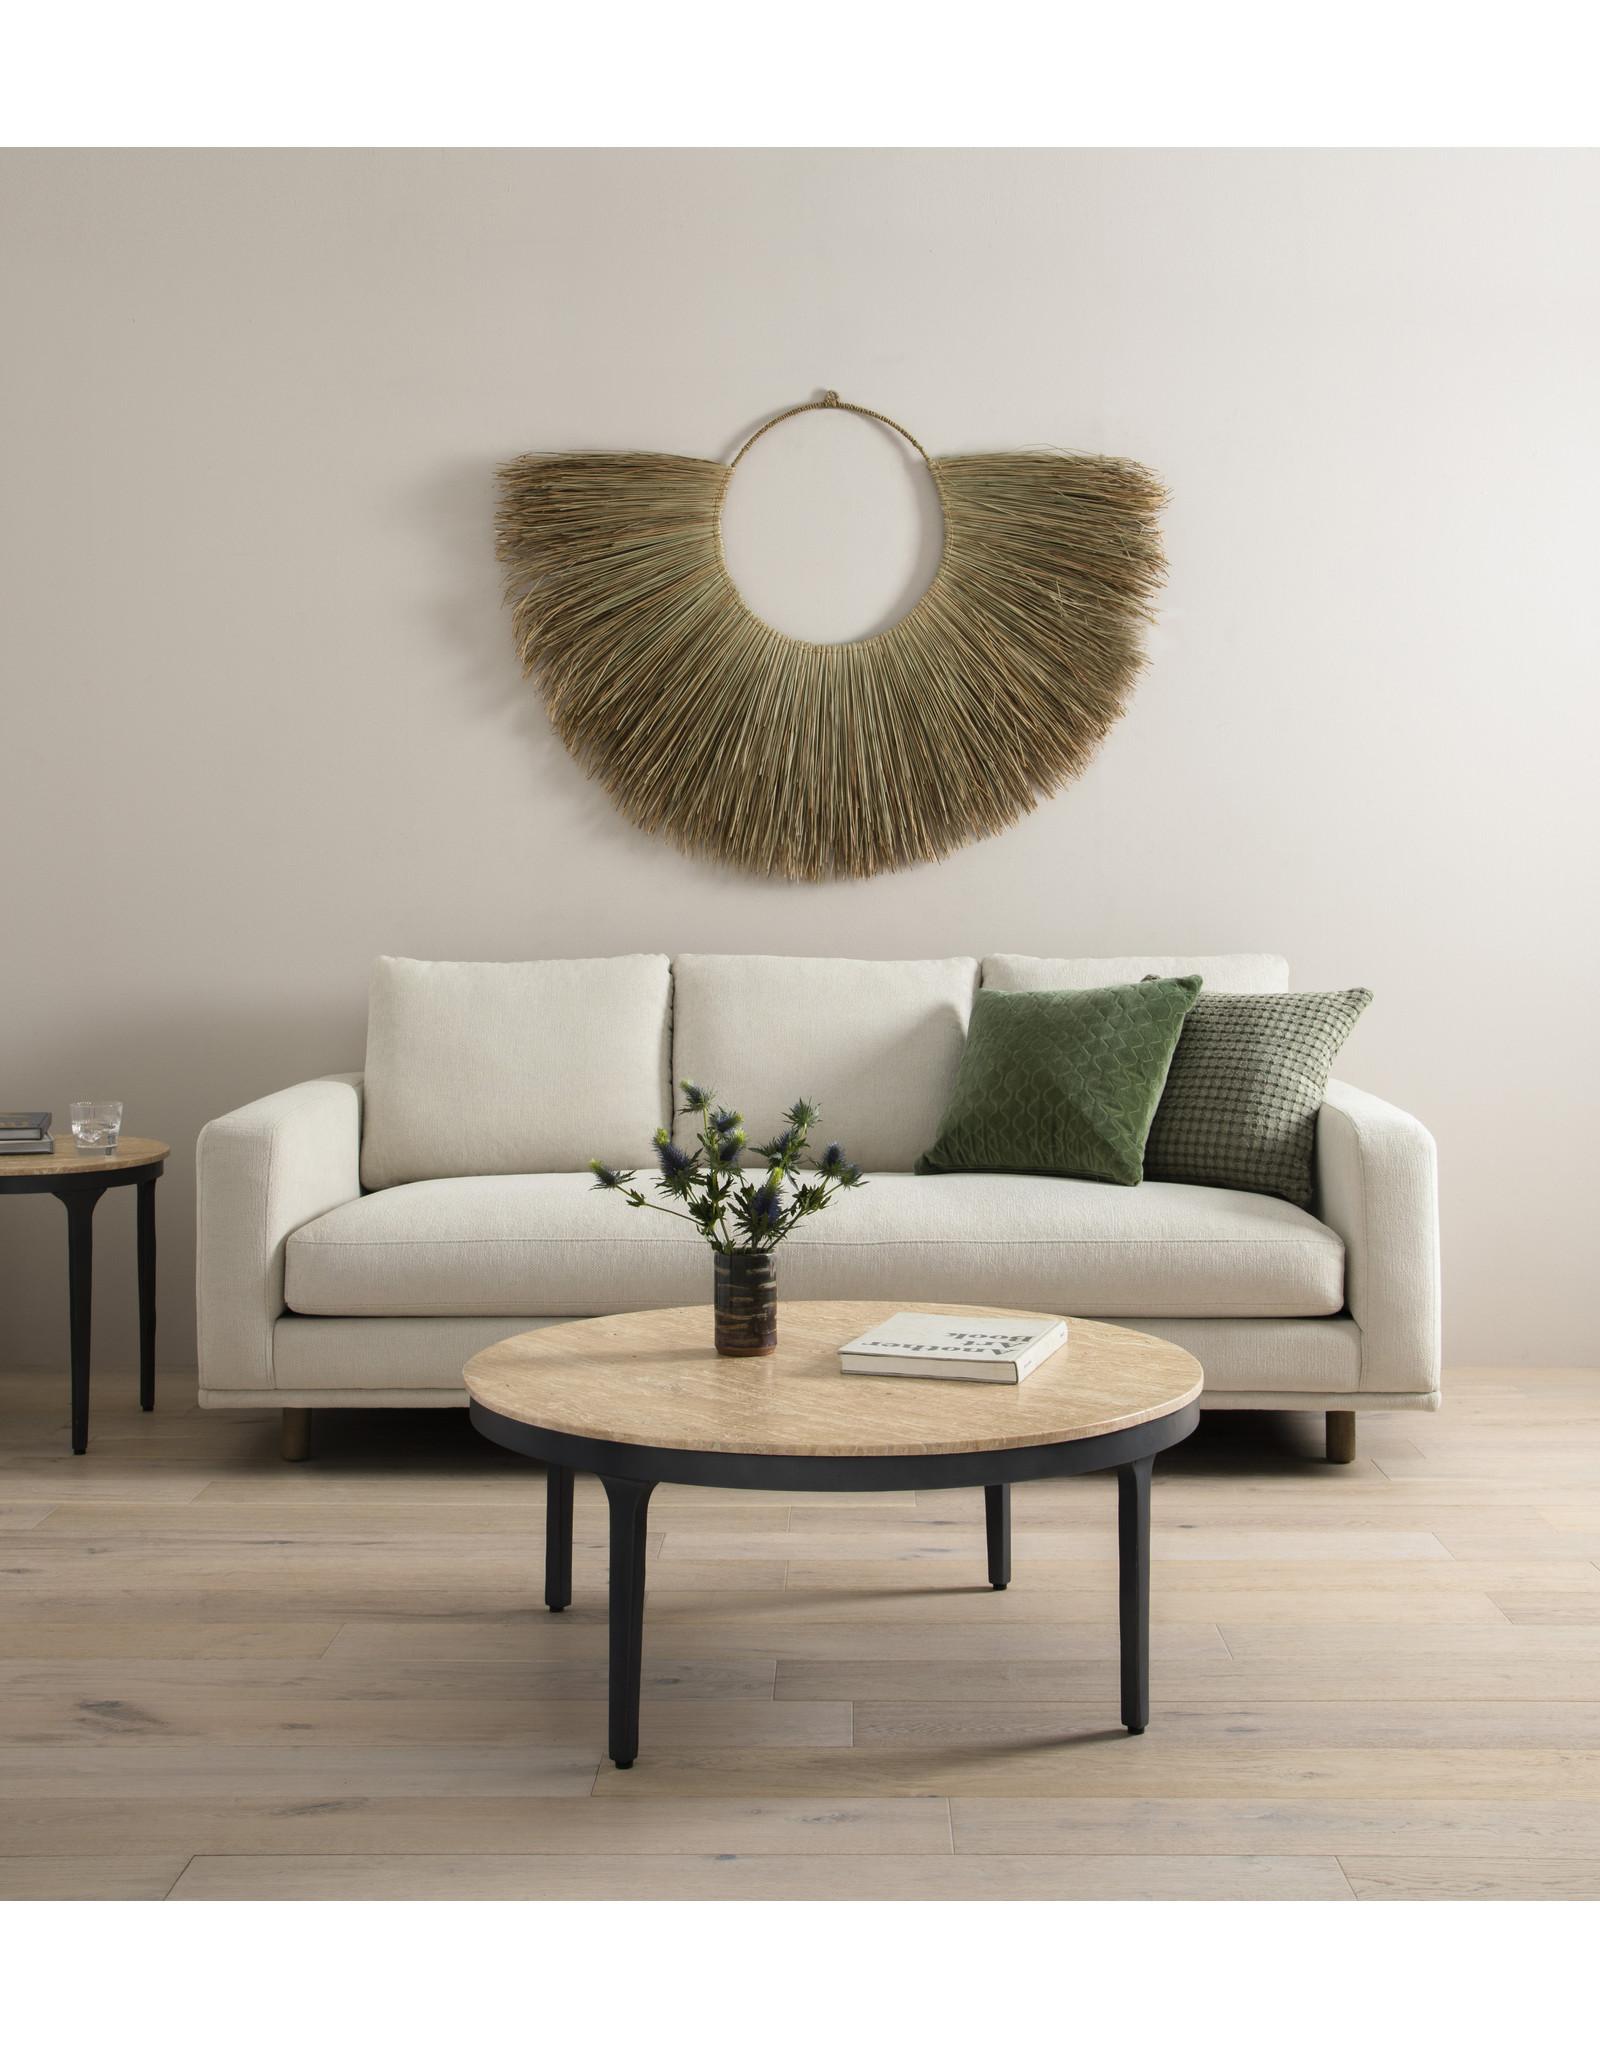 *Dom Sofa